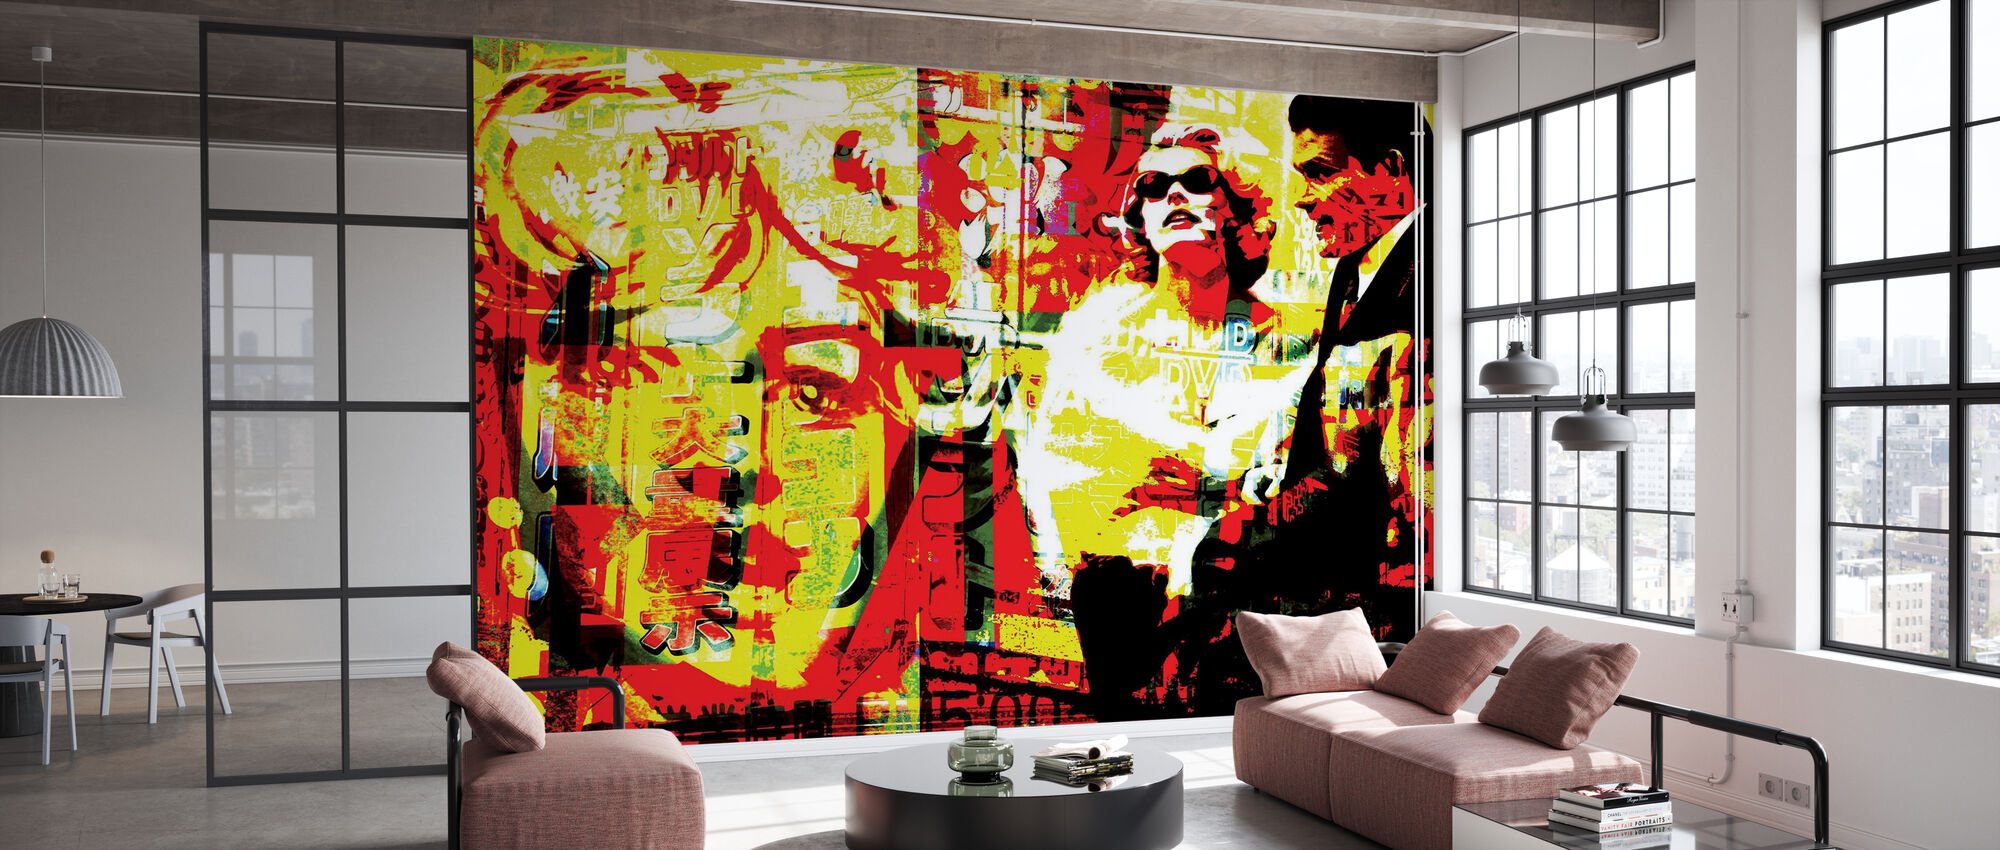 Marilyn Icon - Wallpaper - Office